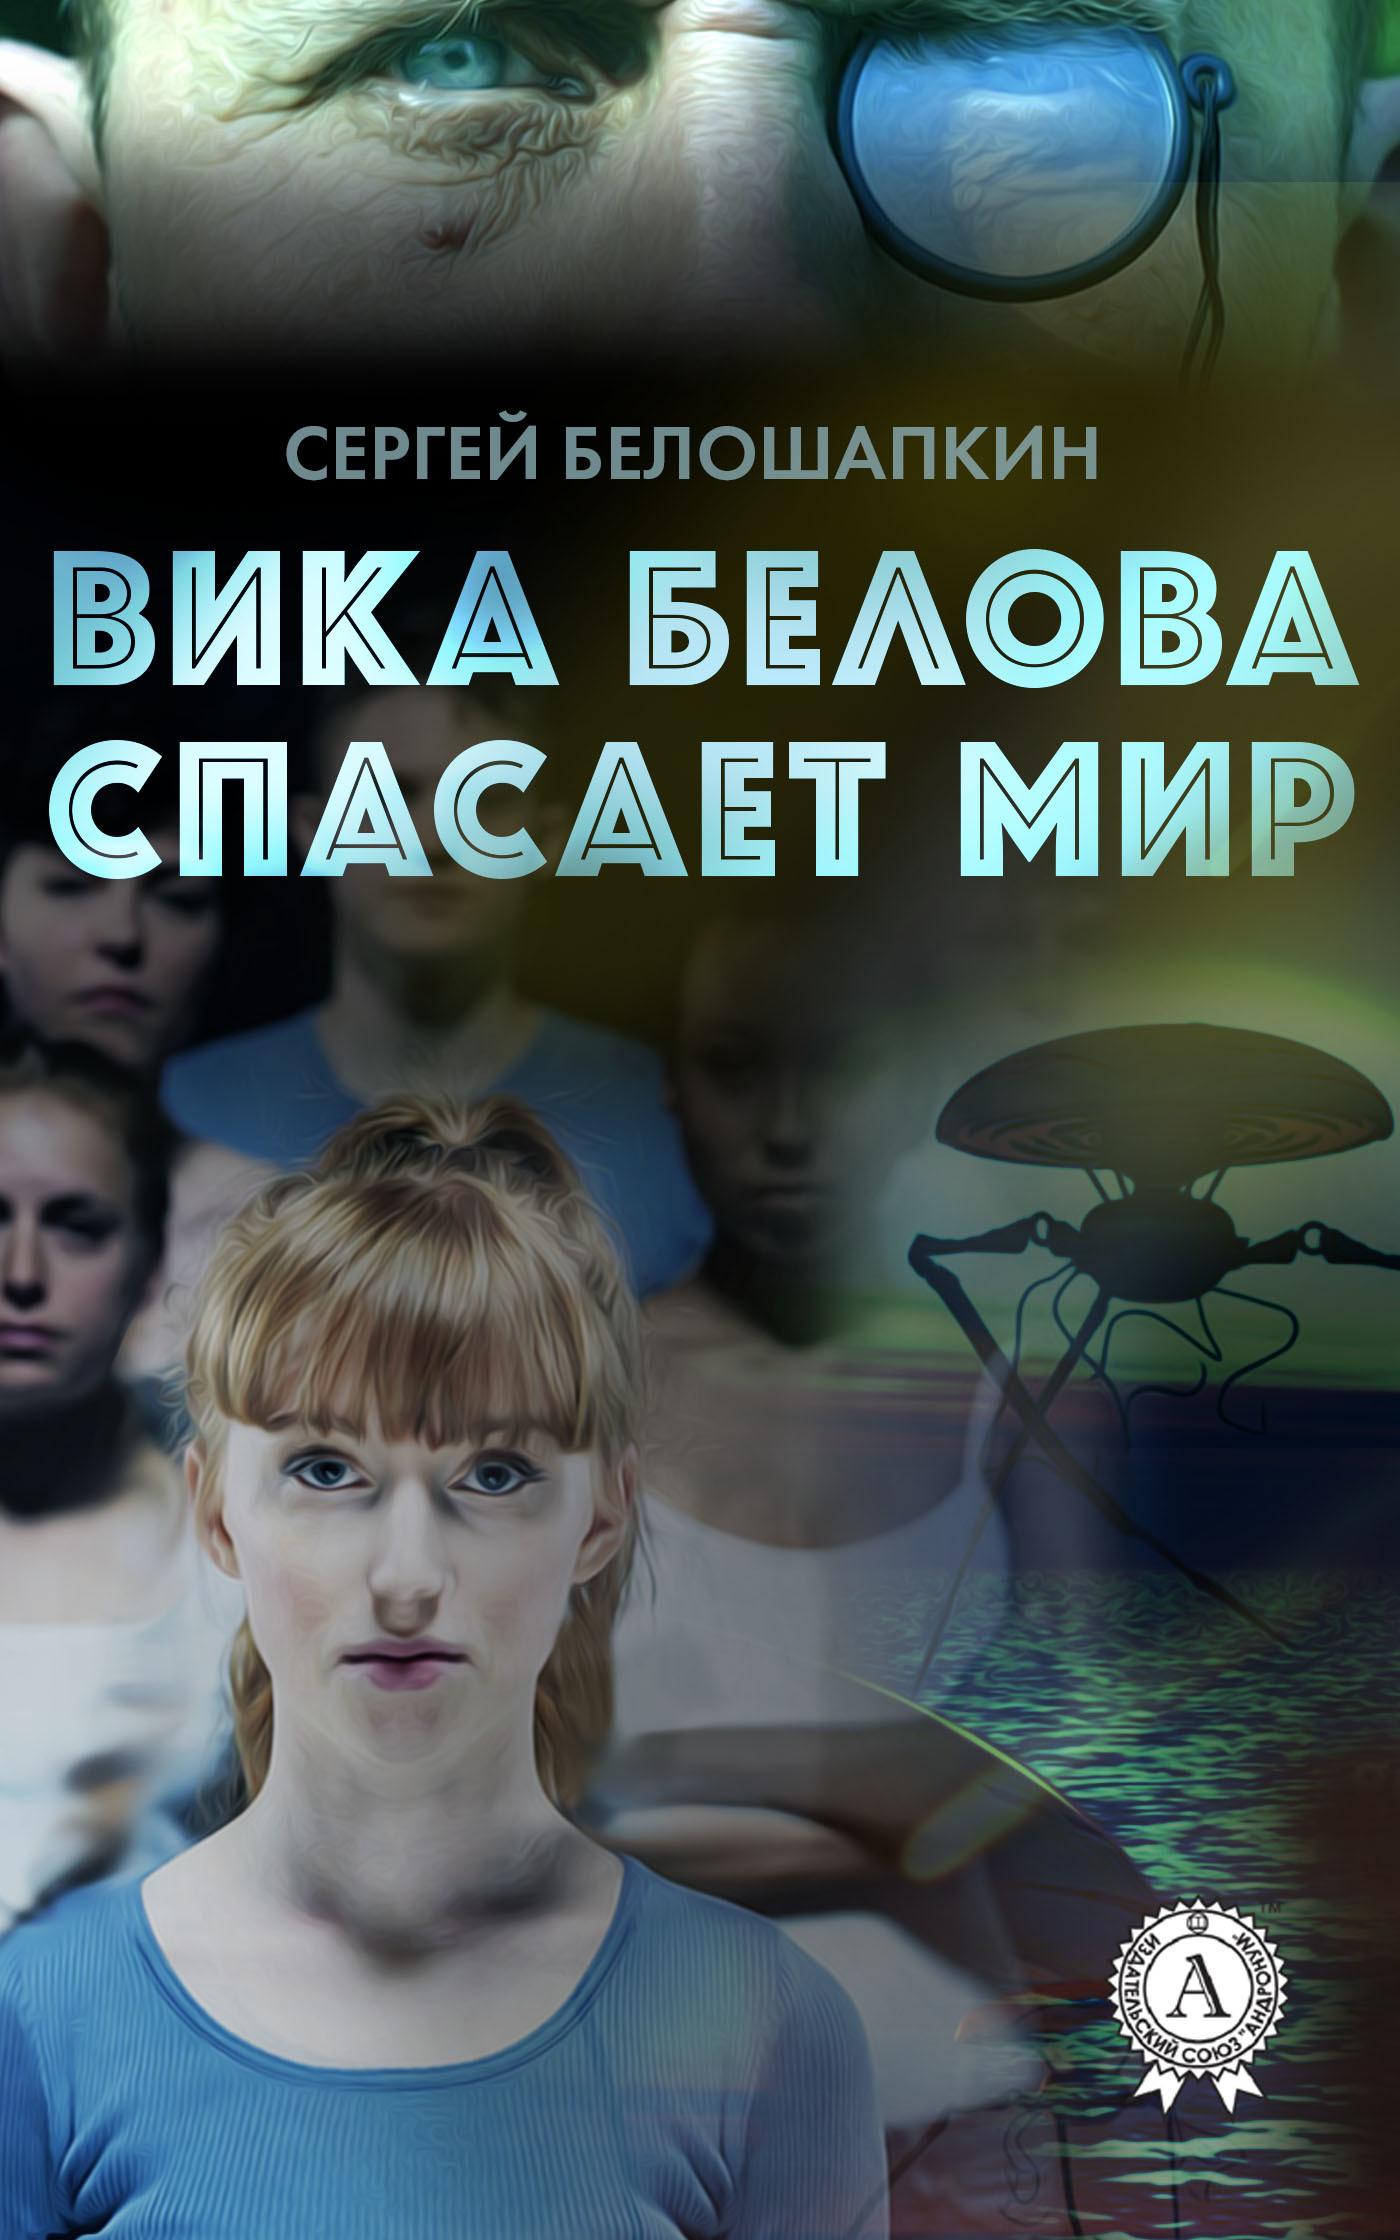 Сергей Белошапкин Вика Белова спасает мир сергей белошапкин вика белова спасает мир